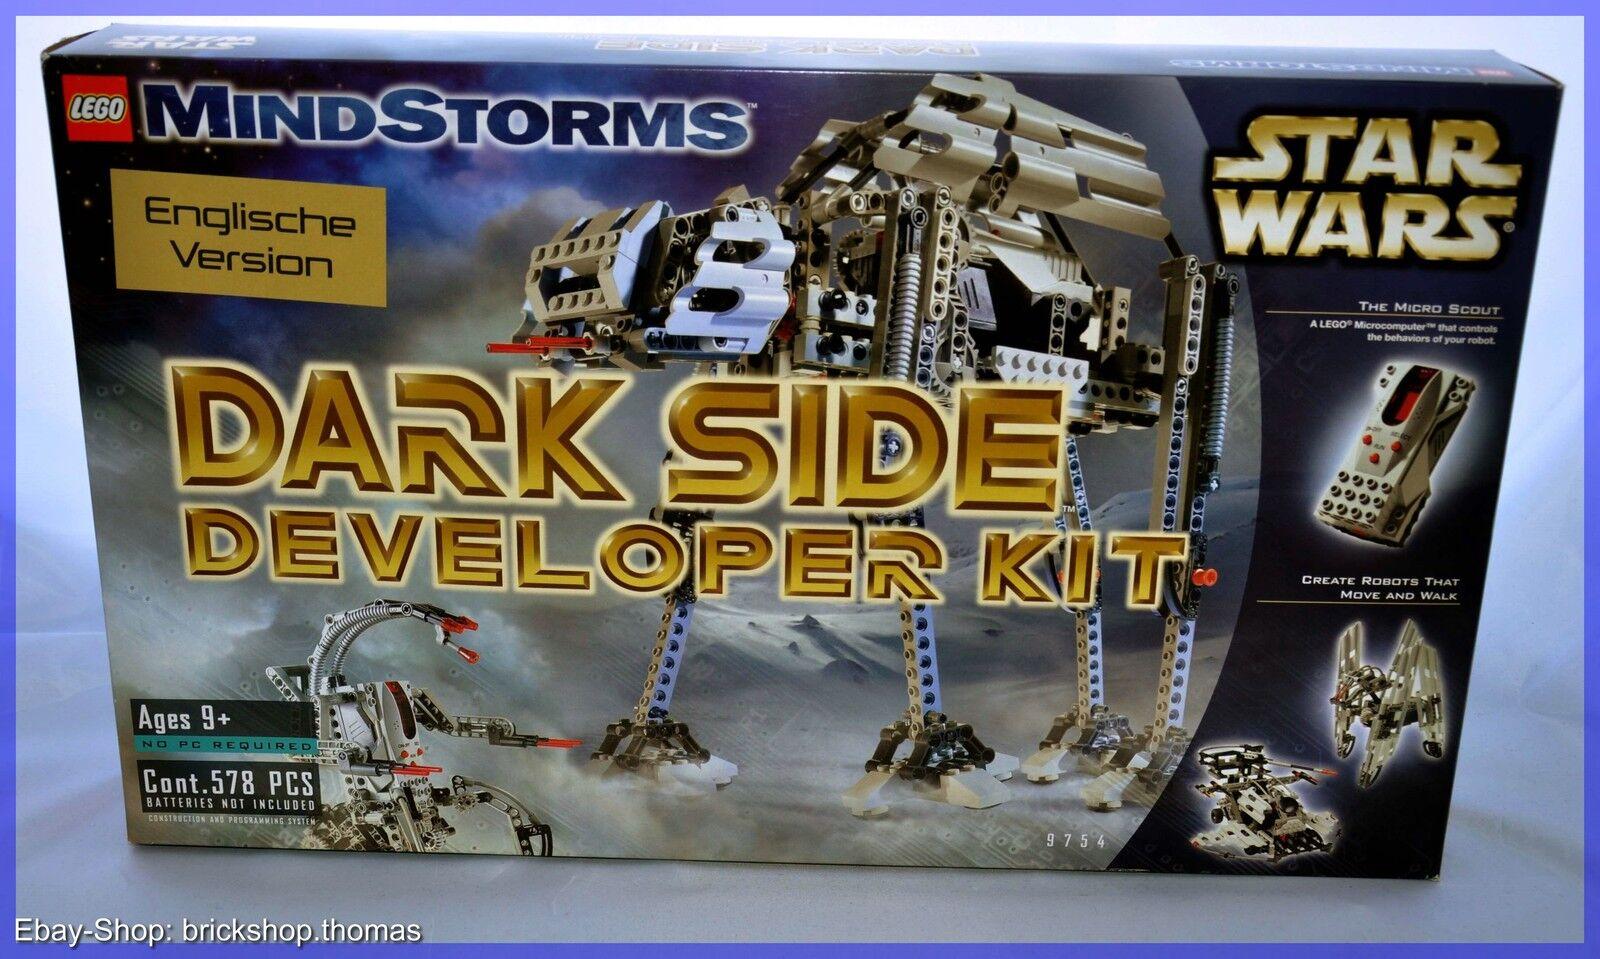 Lego Star Wars 9754-Dark Side Developer Kit-versión en inglés-nuevo embalaje original